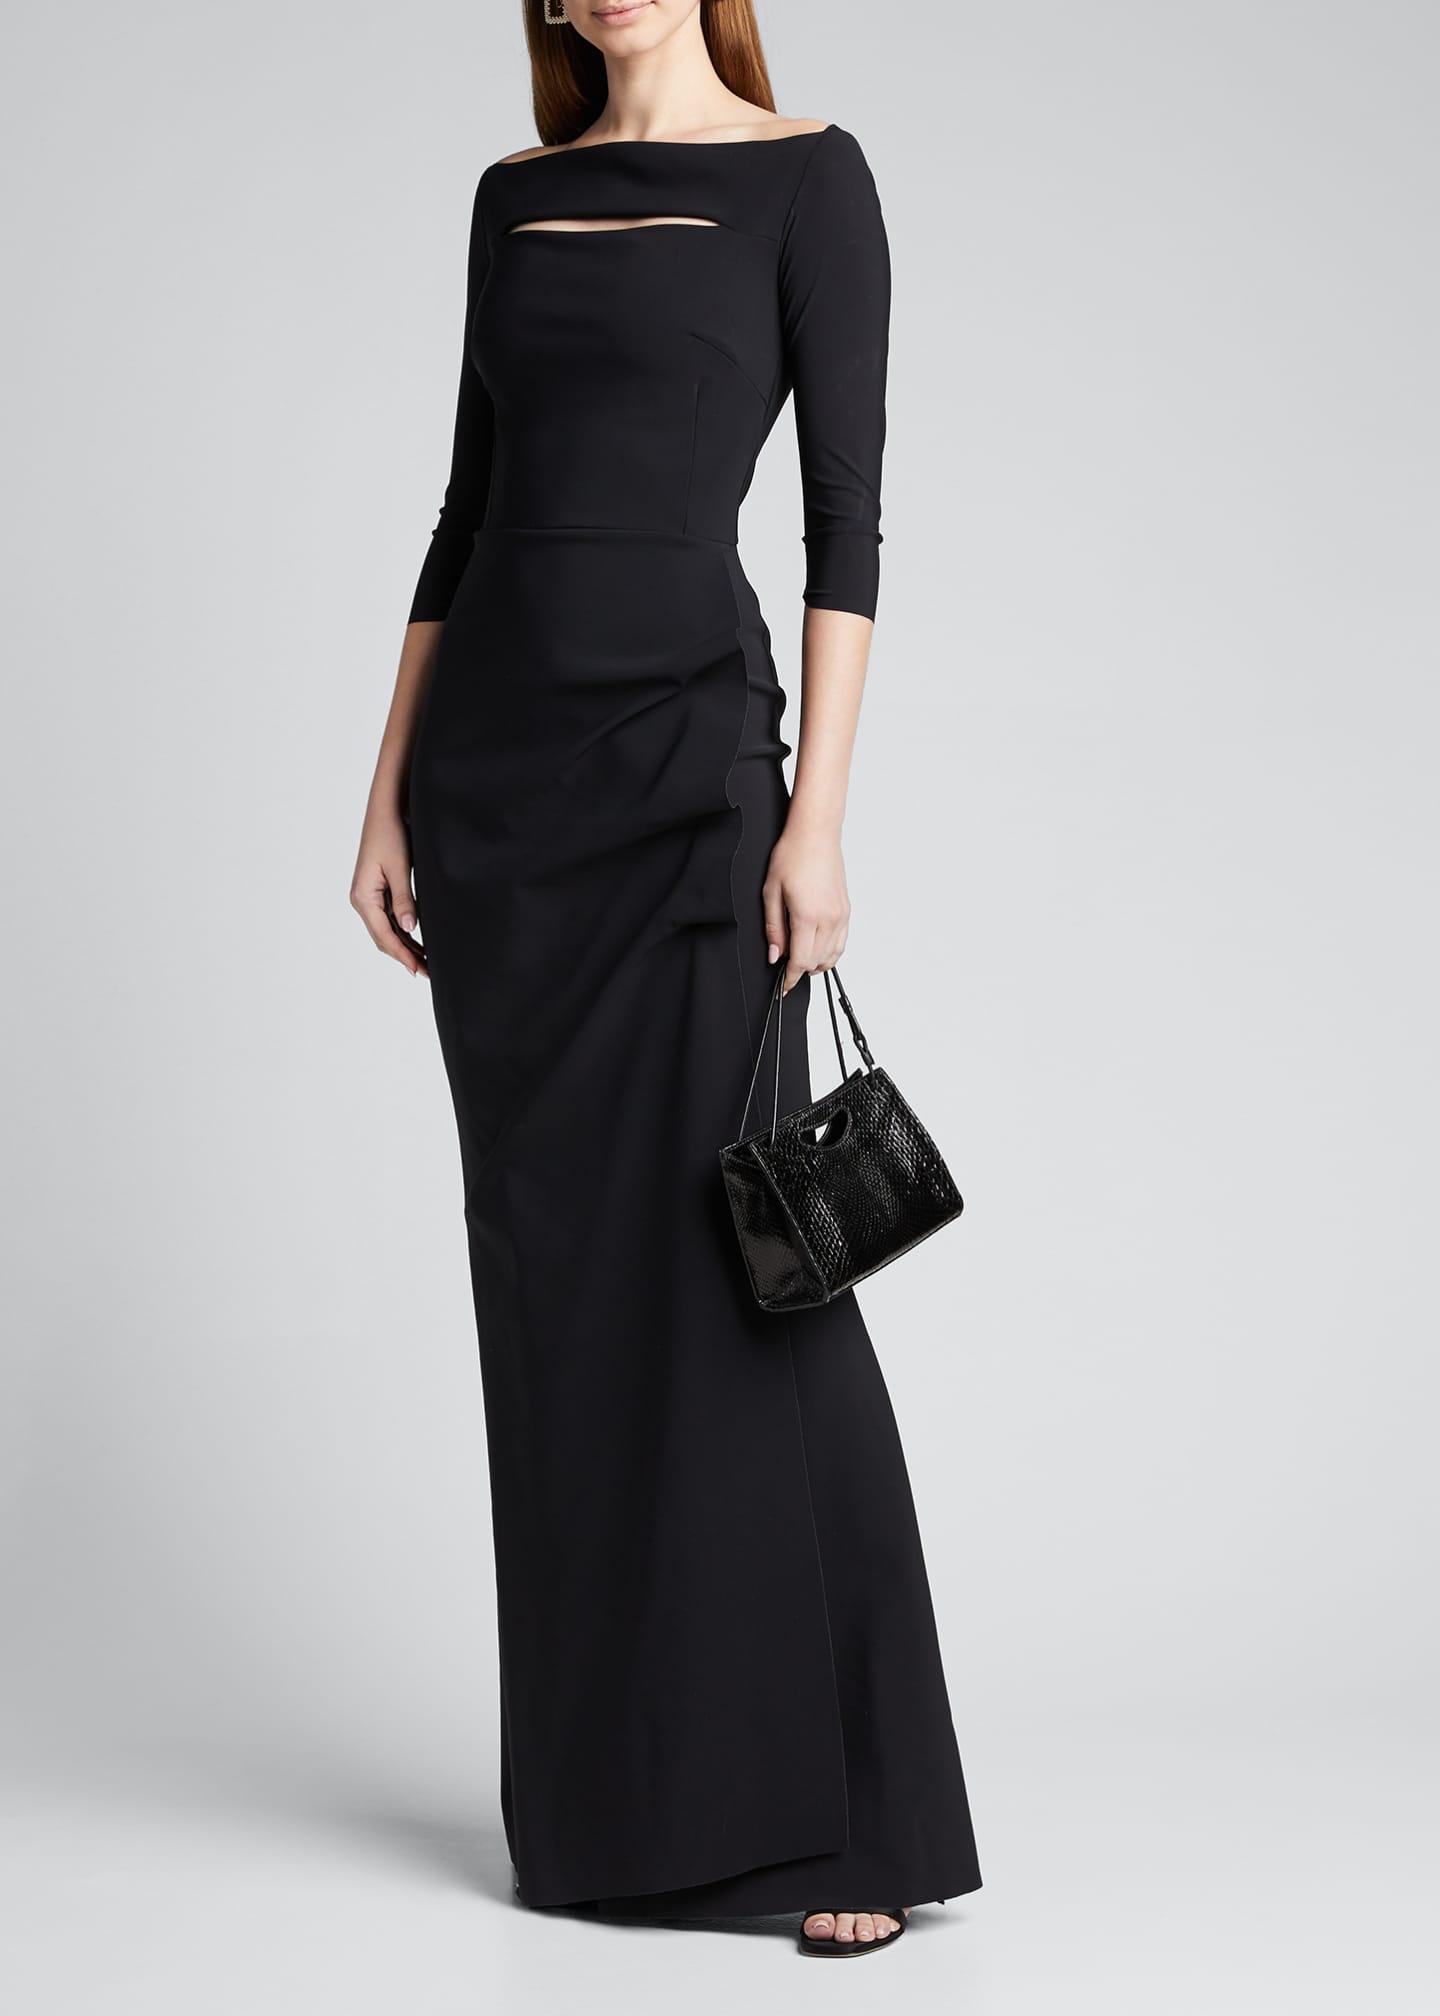 Chiara Boni La Petite Robe Kate Long-Sleeve Gathered